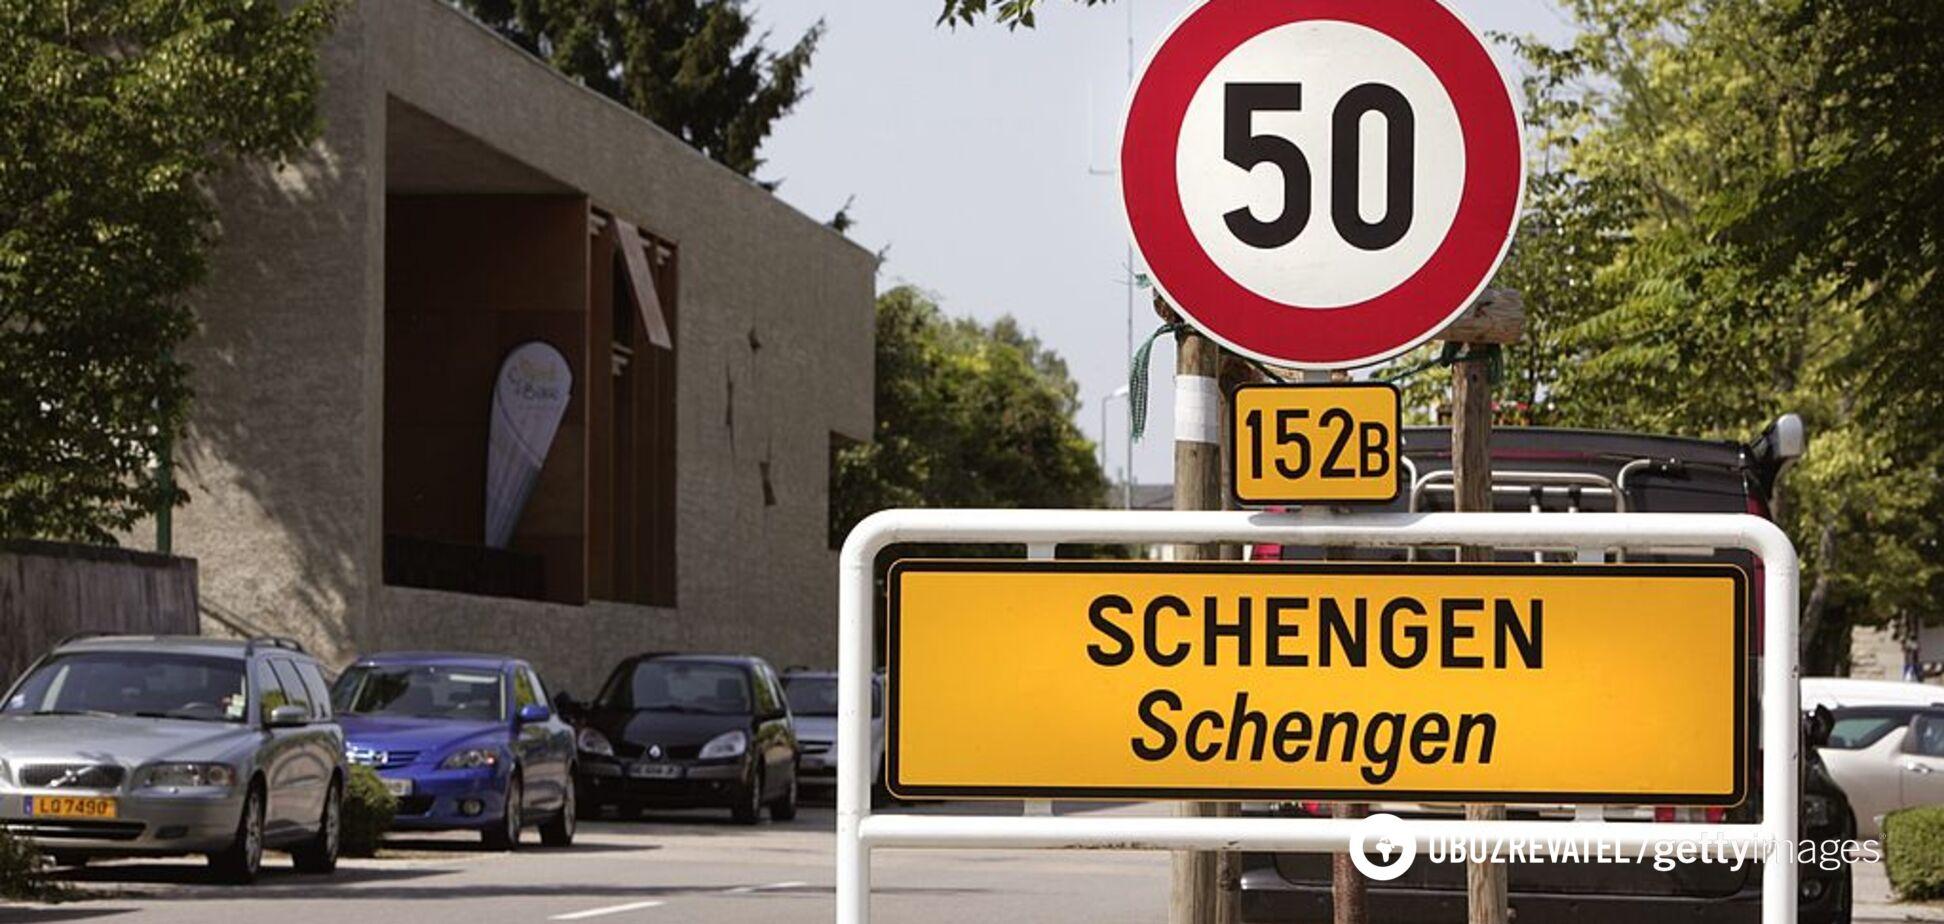 Обмеження на поїздки всередині Шенгенської зони продовжать